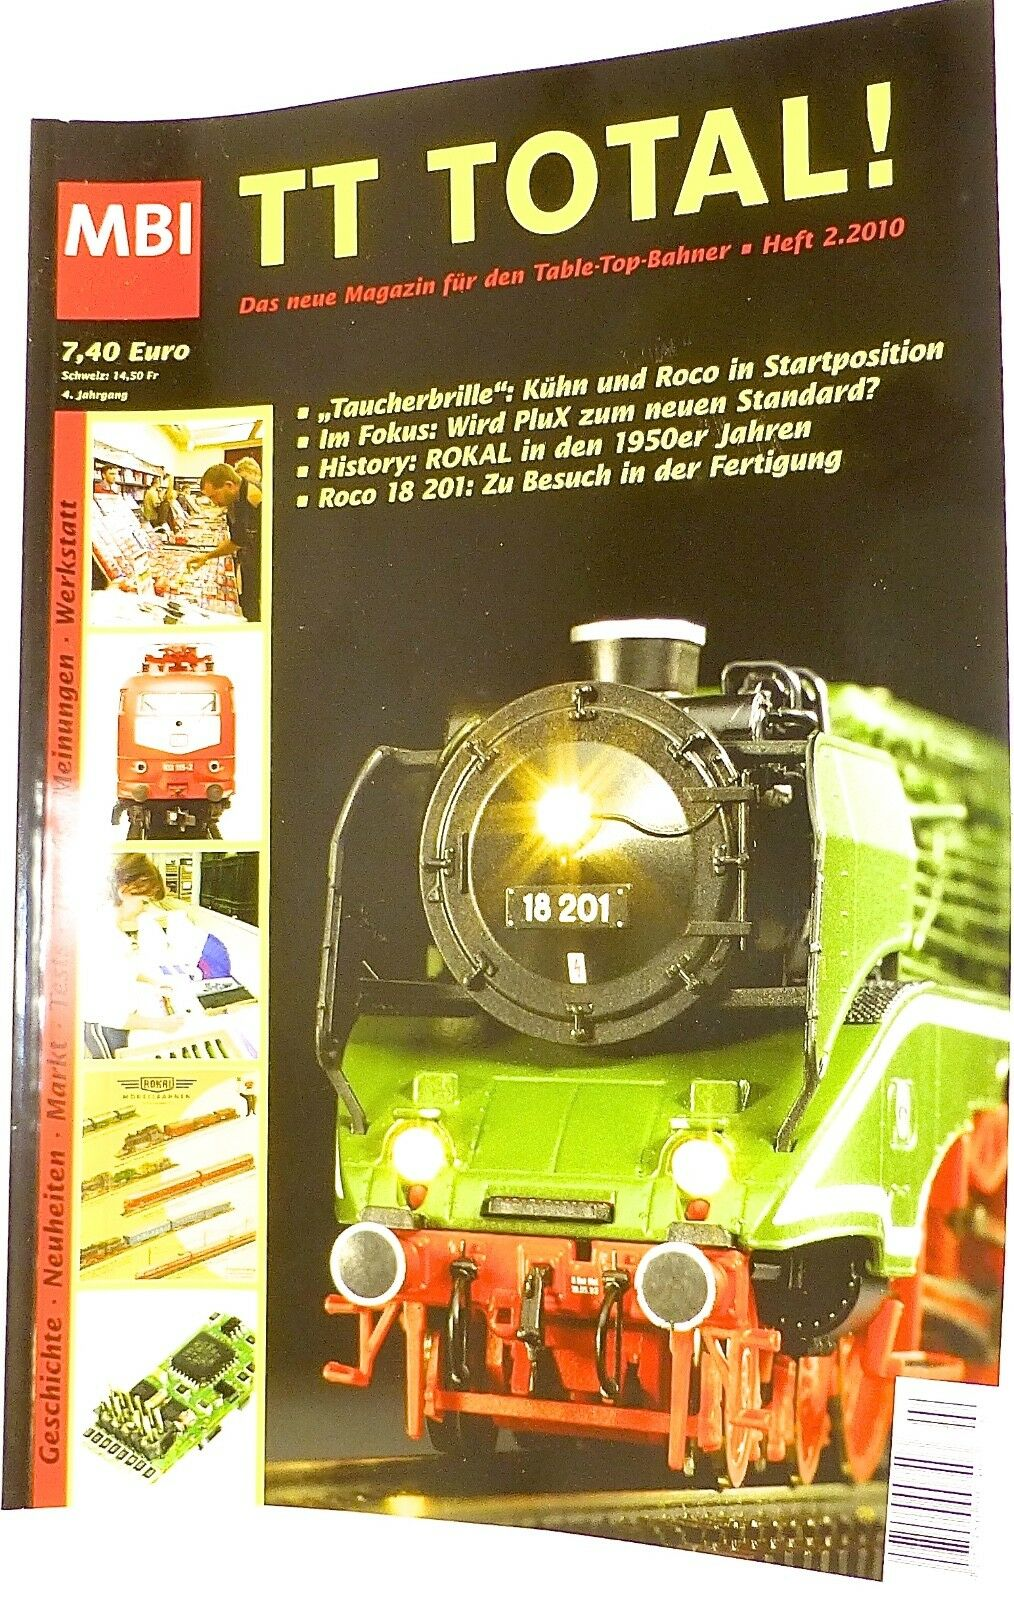 TT Total 4te Jahrgang Heft 2.2000 aus 2010 MBI µ